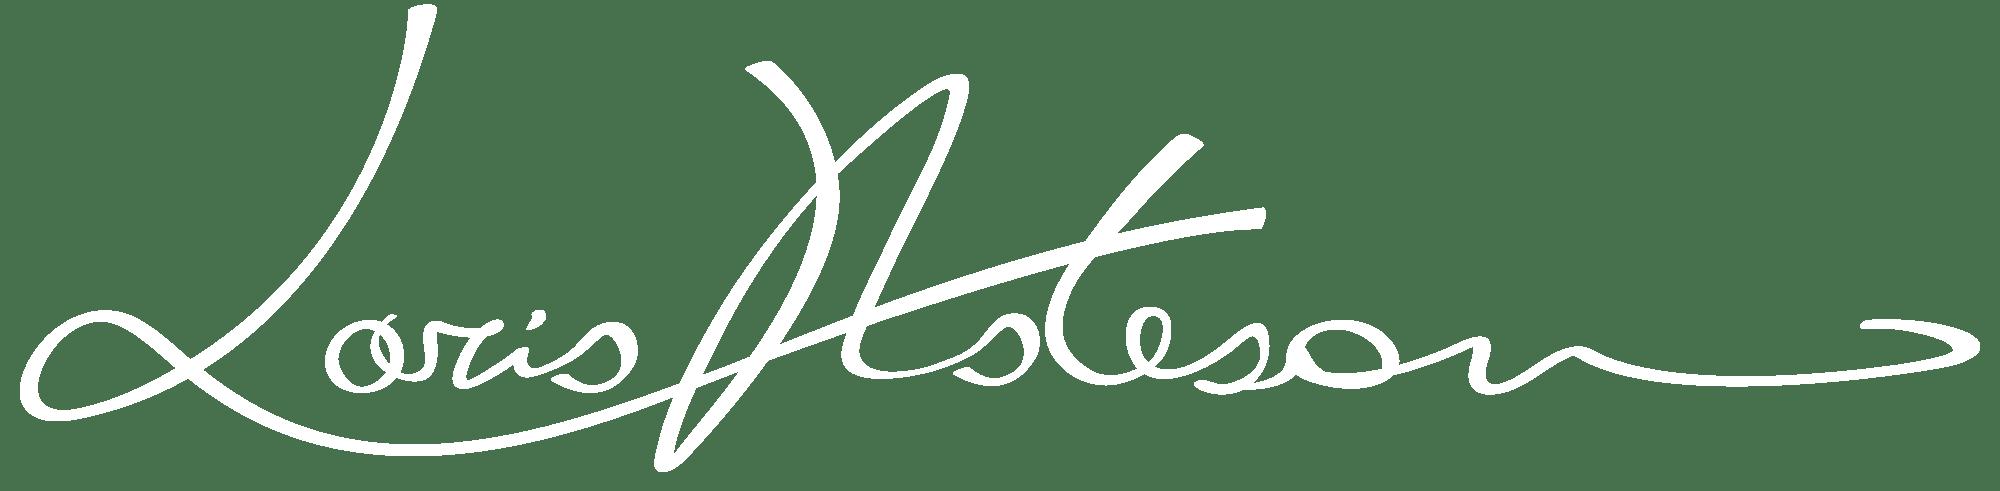 lo.a.st